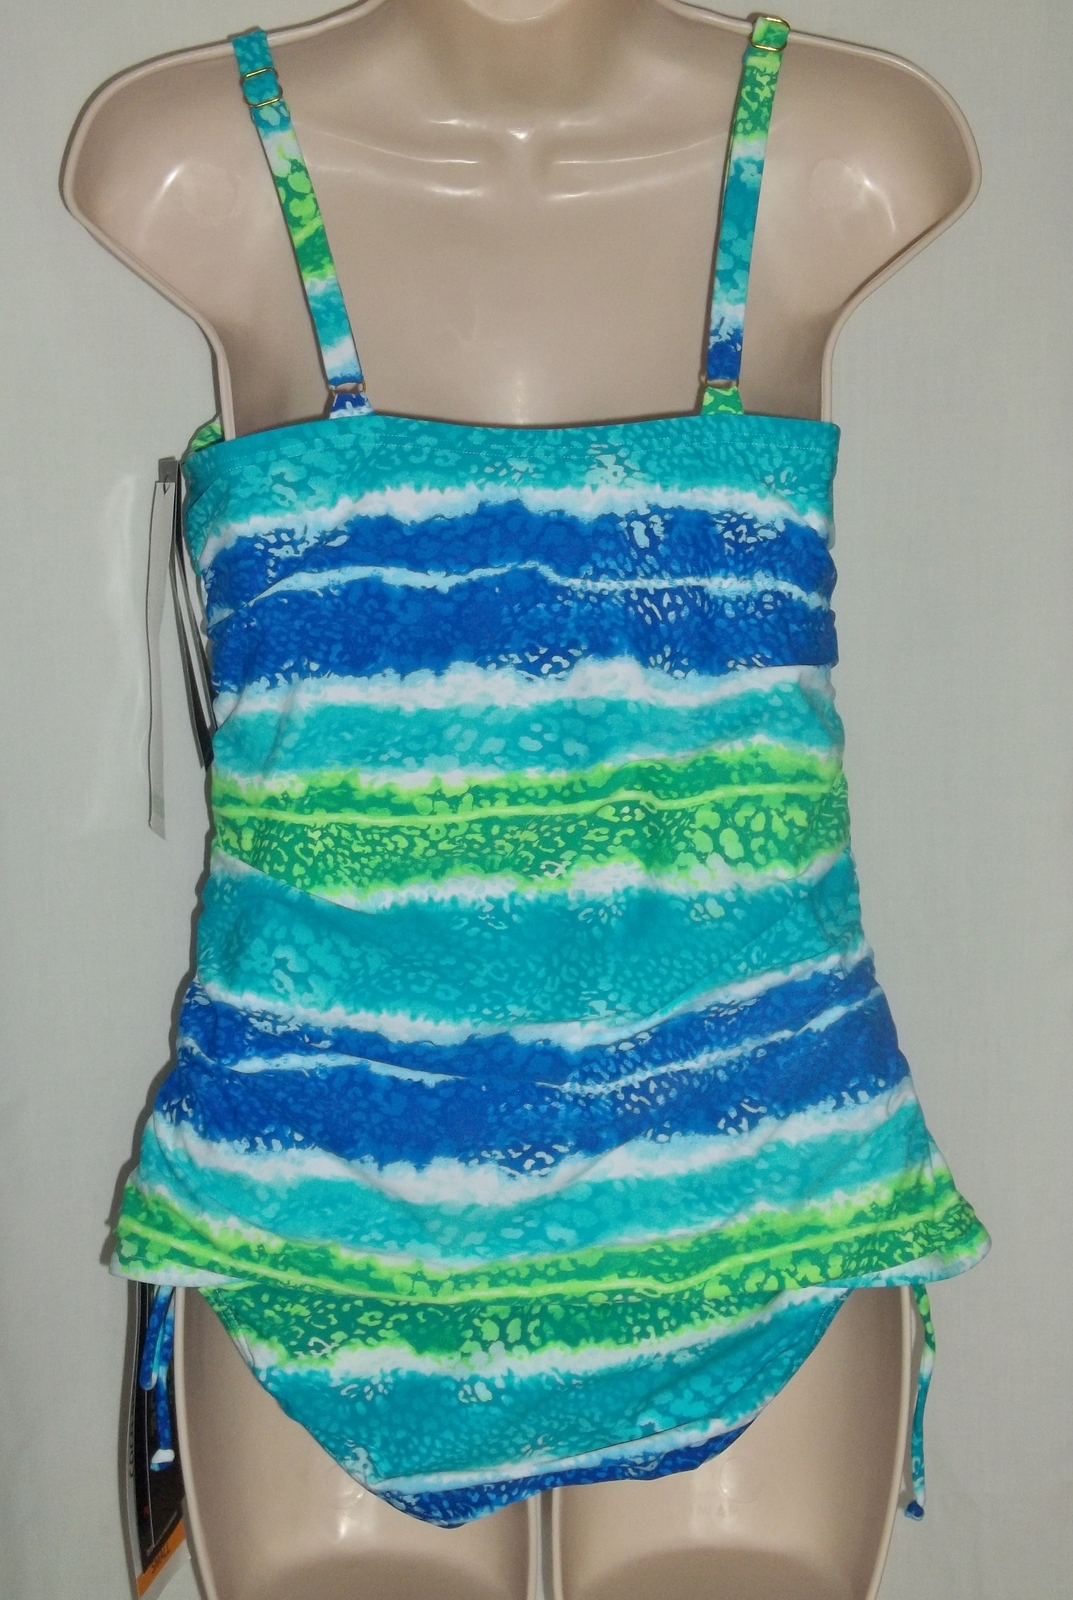 COCO REEF BLUE SEA TANKINI & CINCHED BOTTOM,34C/SMALL